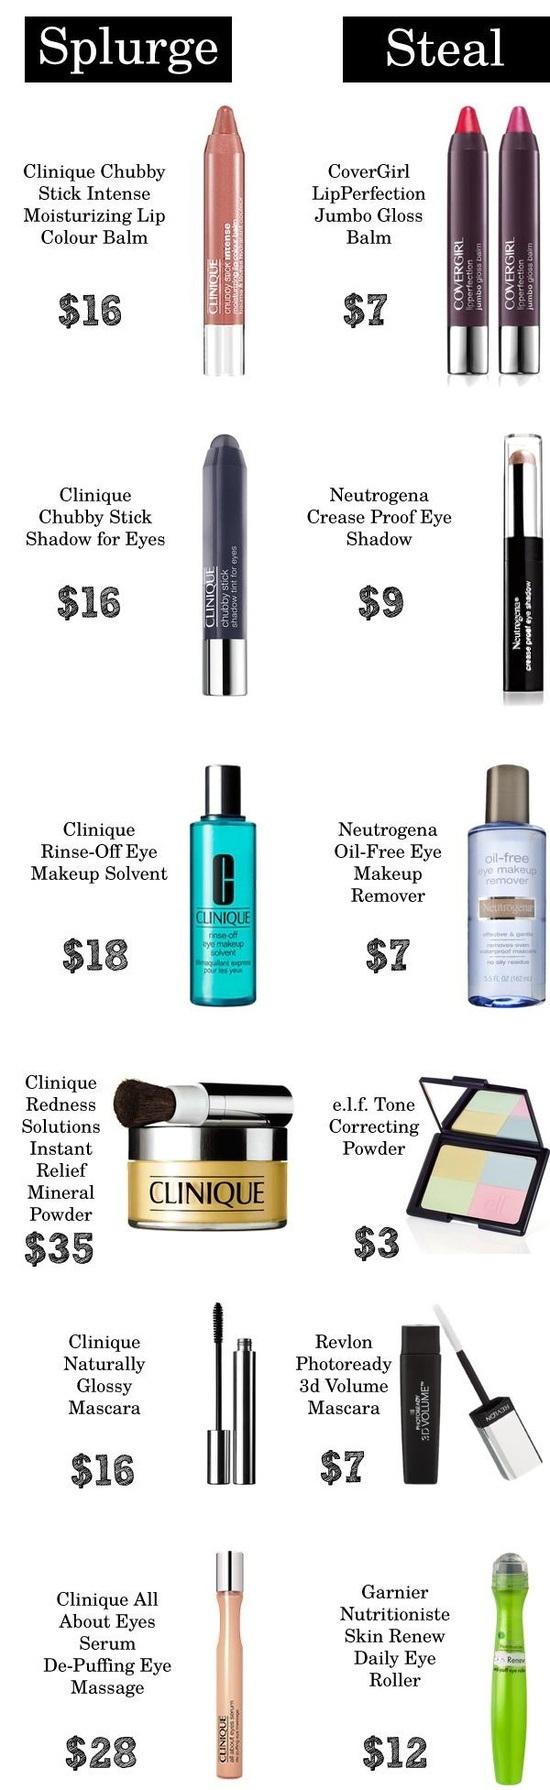 Splurge or Steal Drug Store dupes of Clinique! Makeup